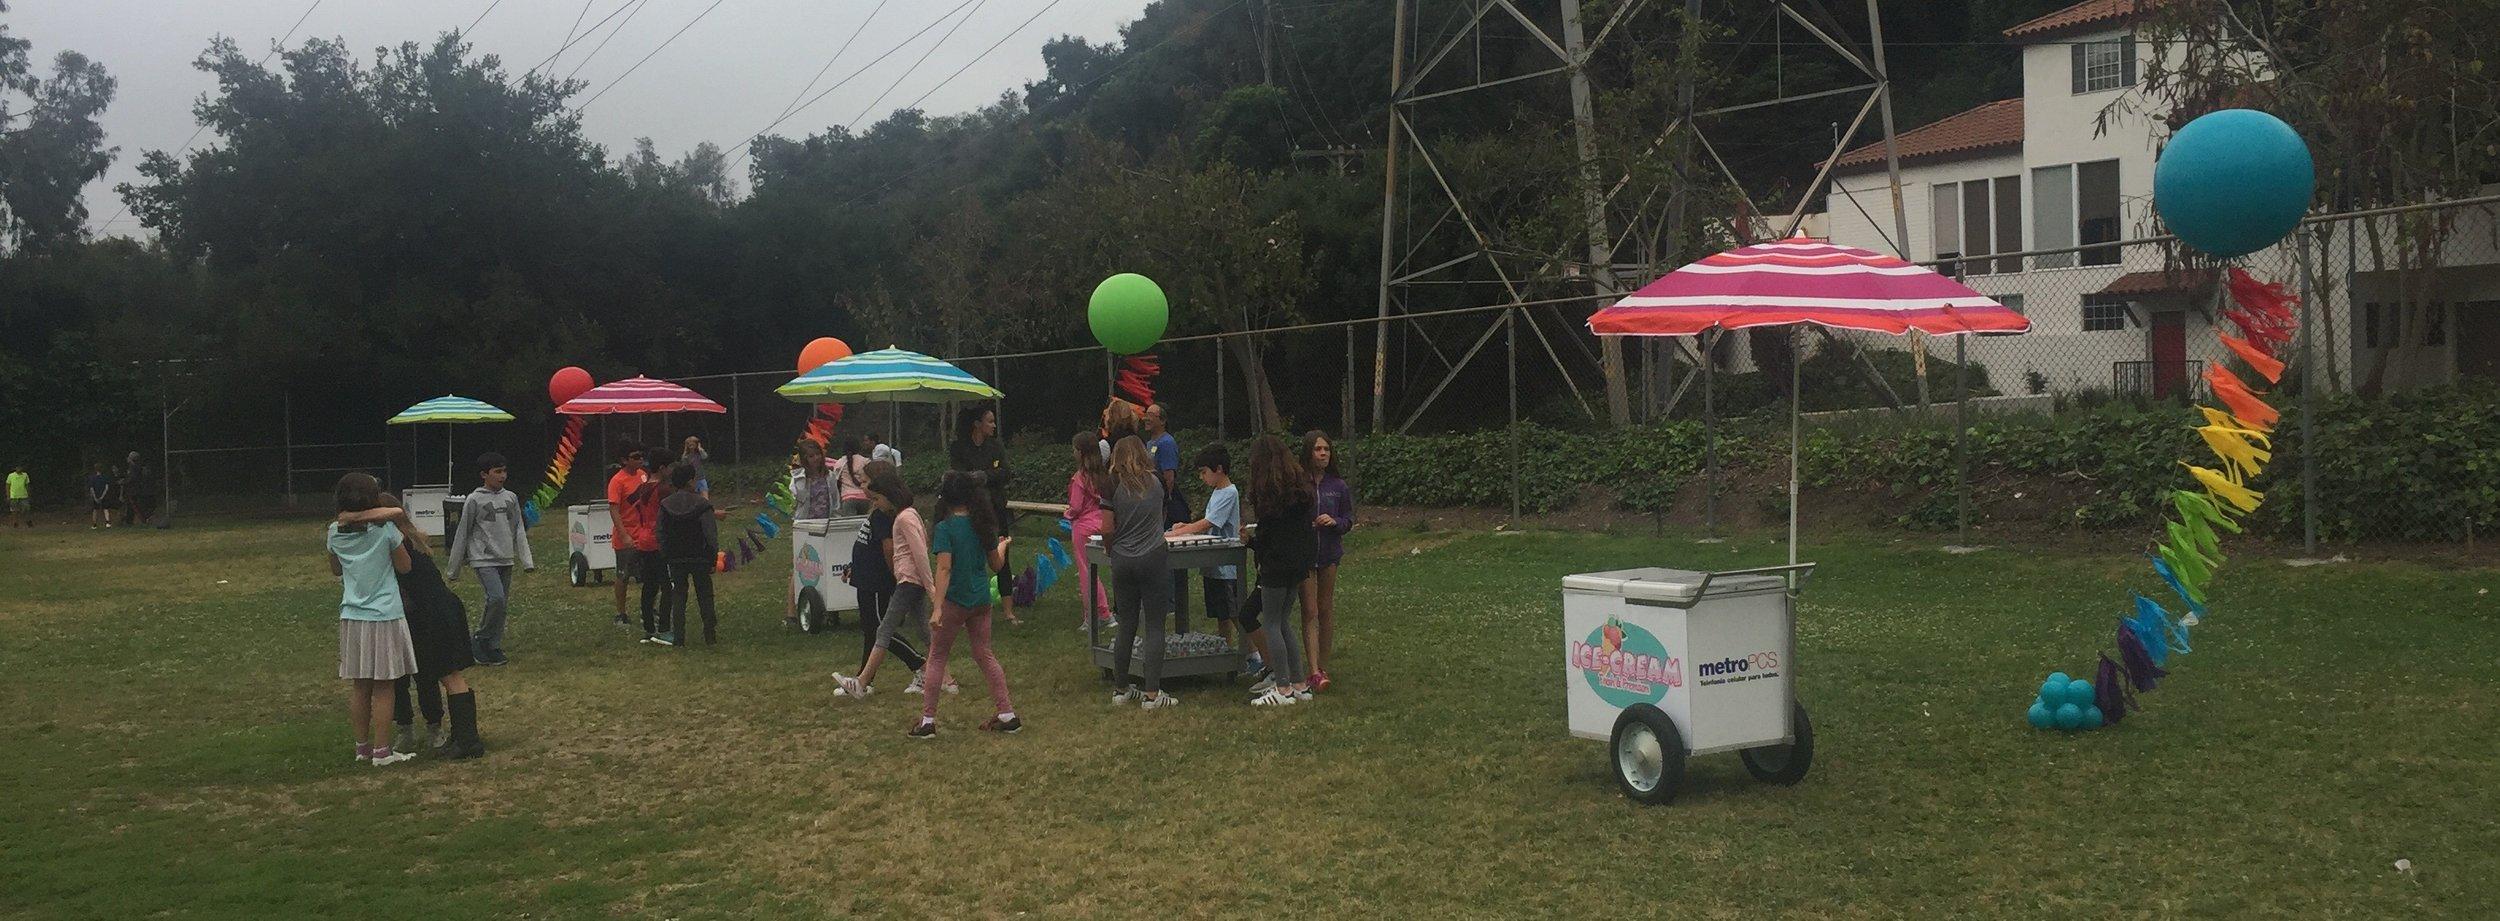 kenter-elementary-ice-cream-event.jpeg